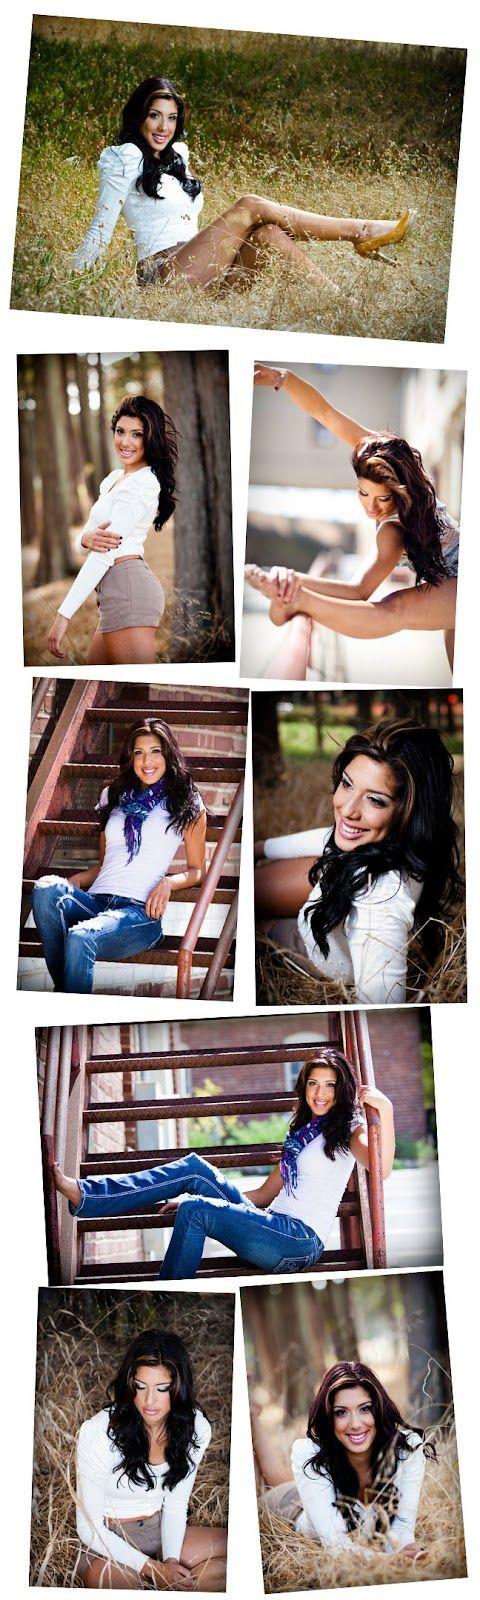 Still Light Studios: Senior Portraits #pose #senior #girl #portrait #session